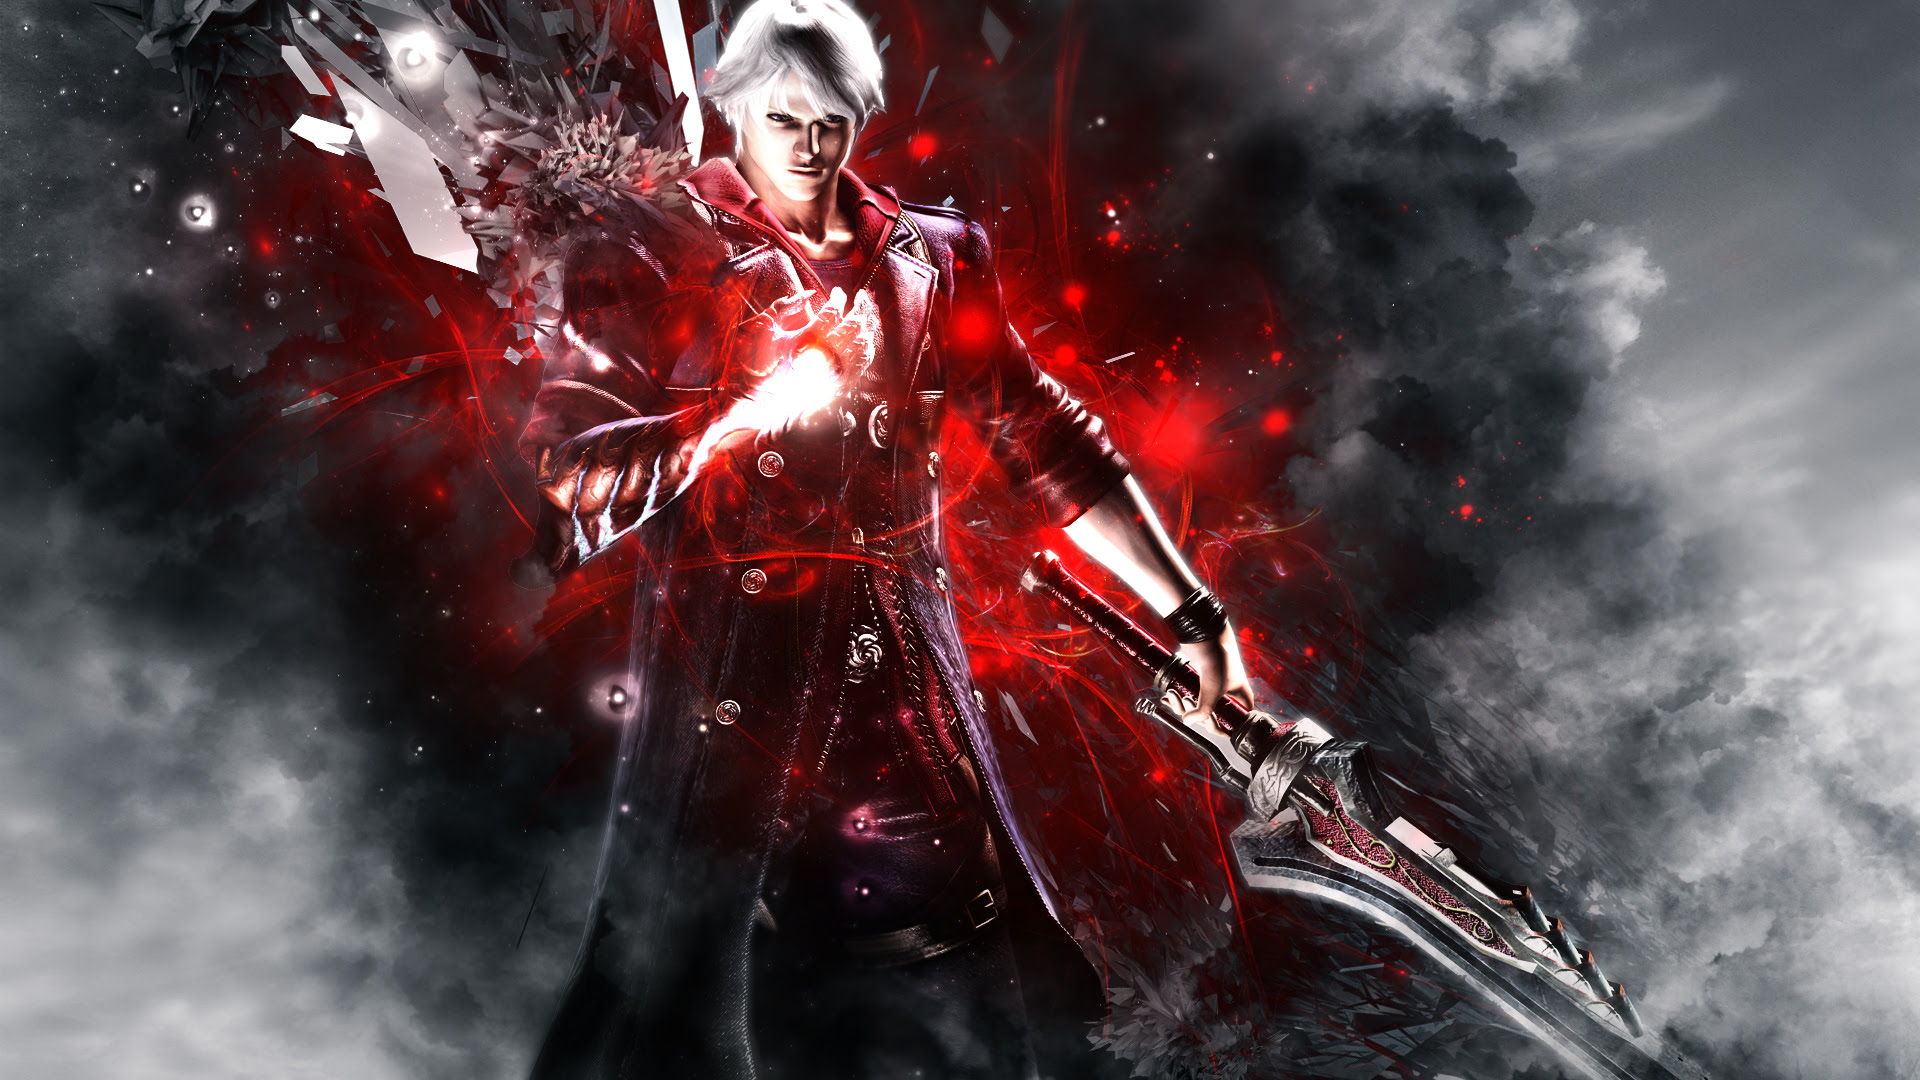 Nero Wallpaper Devil May Cry 4 Wallpaper 36337836 Fanpop